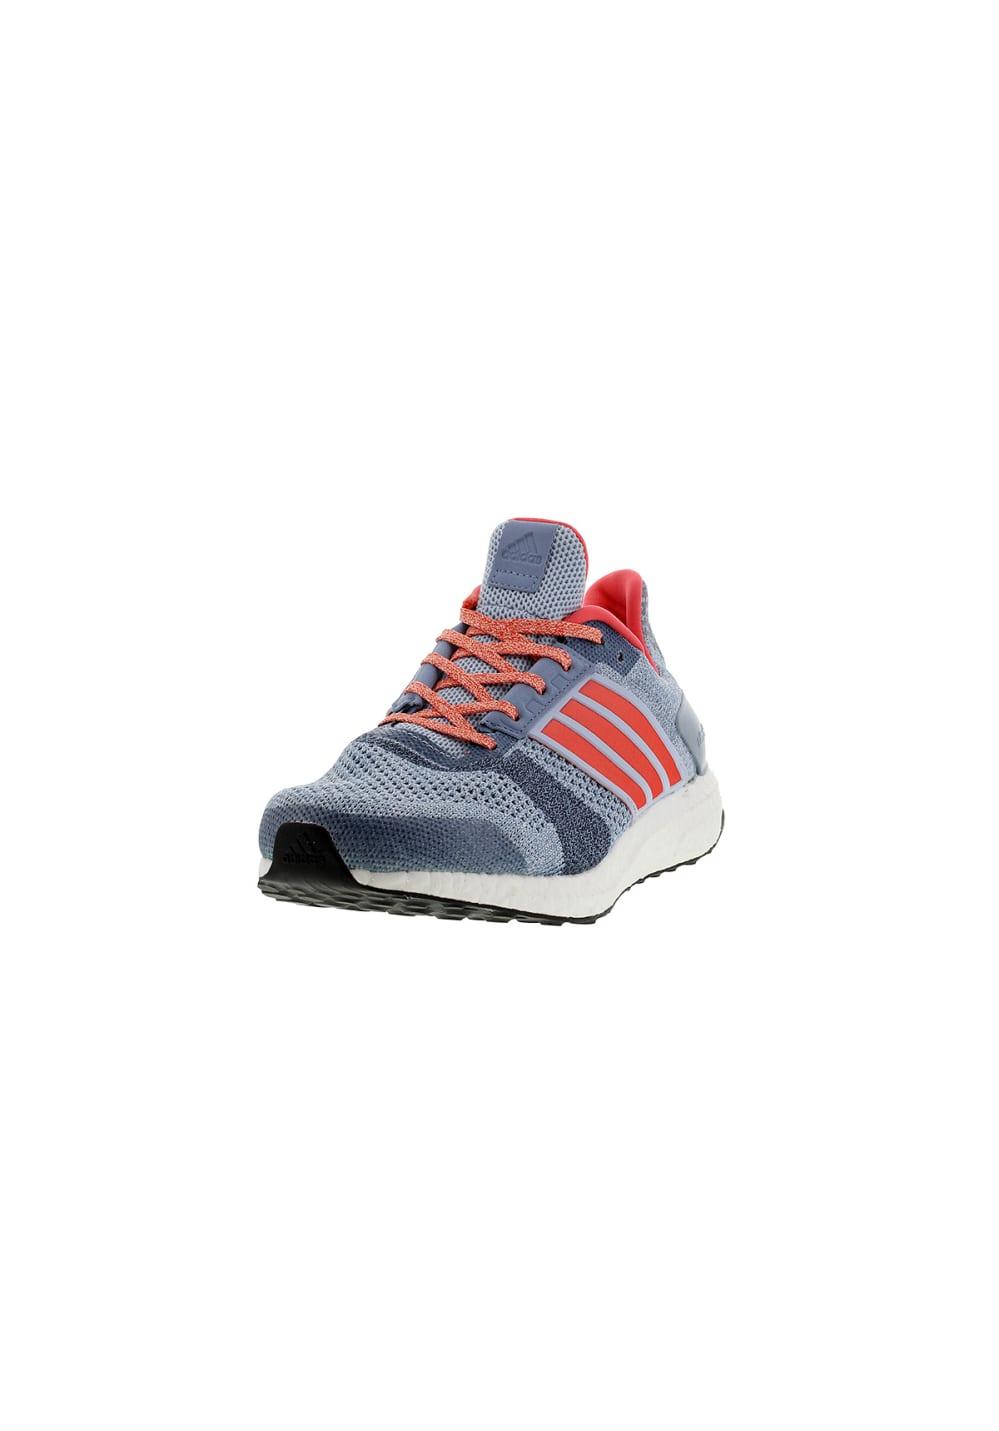 adidas Ultra Boost ST - Laufschuhe für Damen - Blau